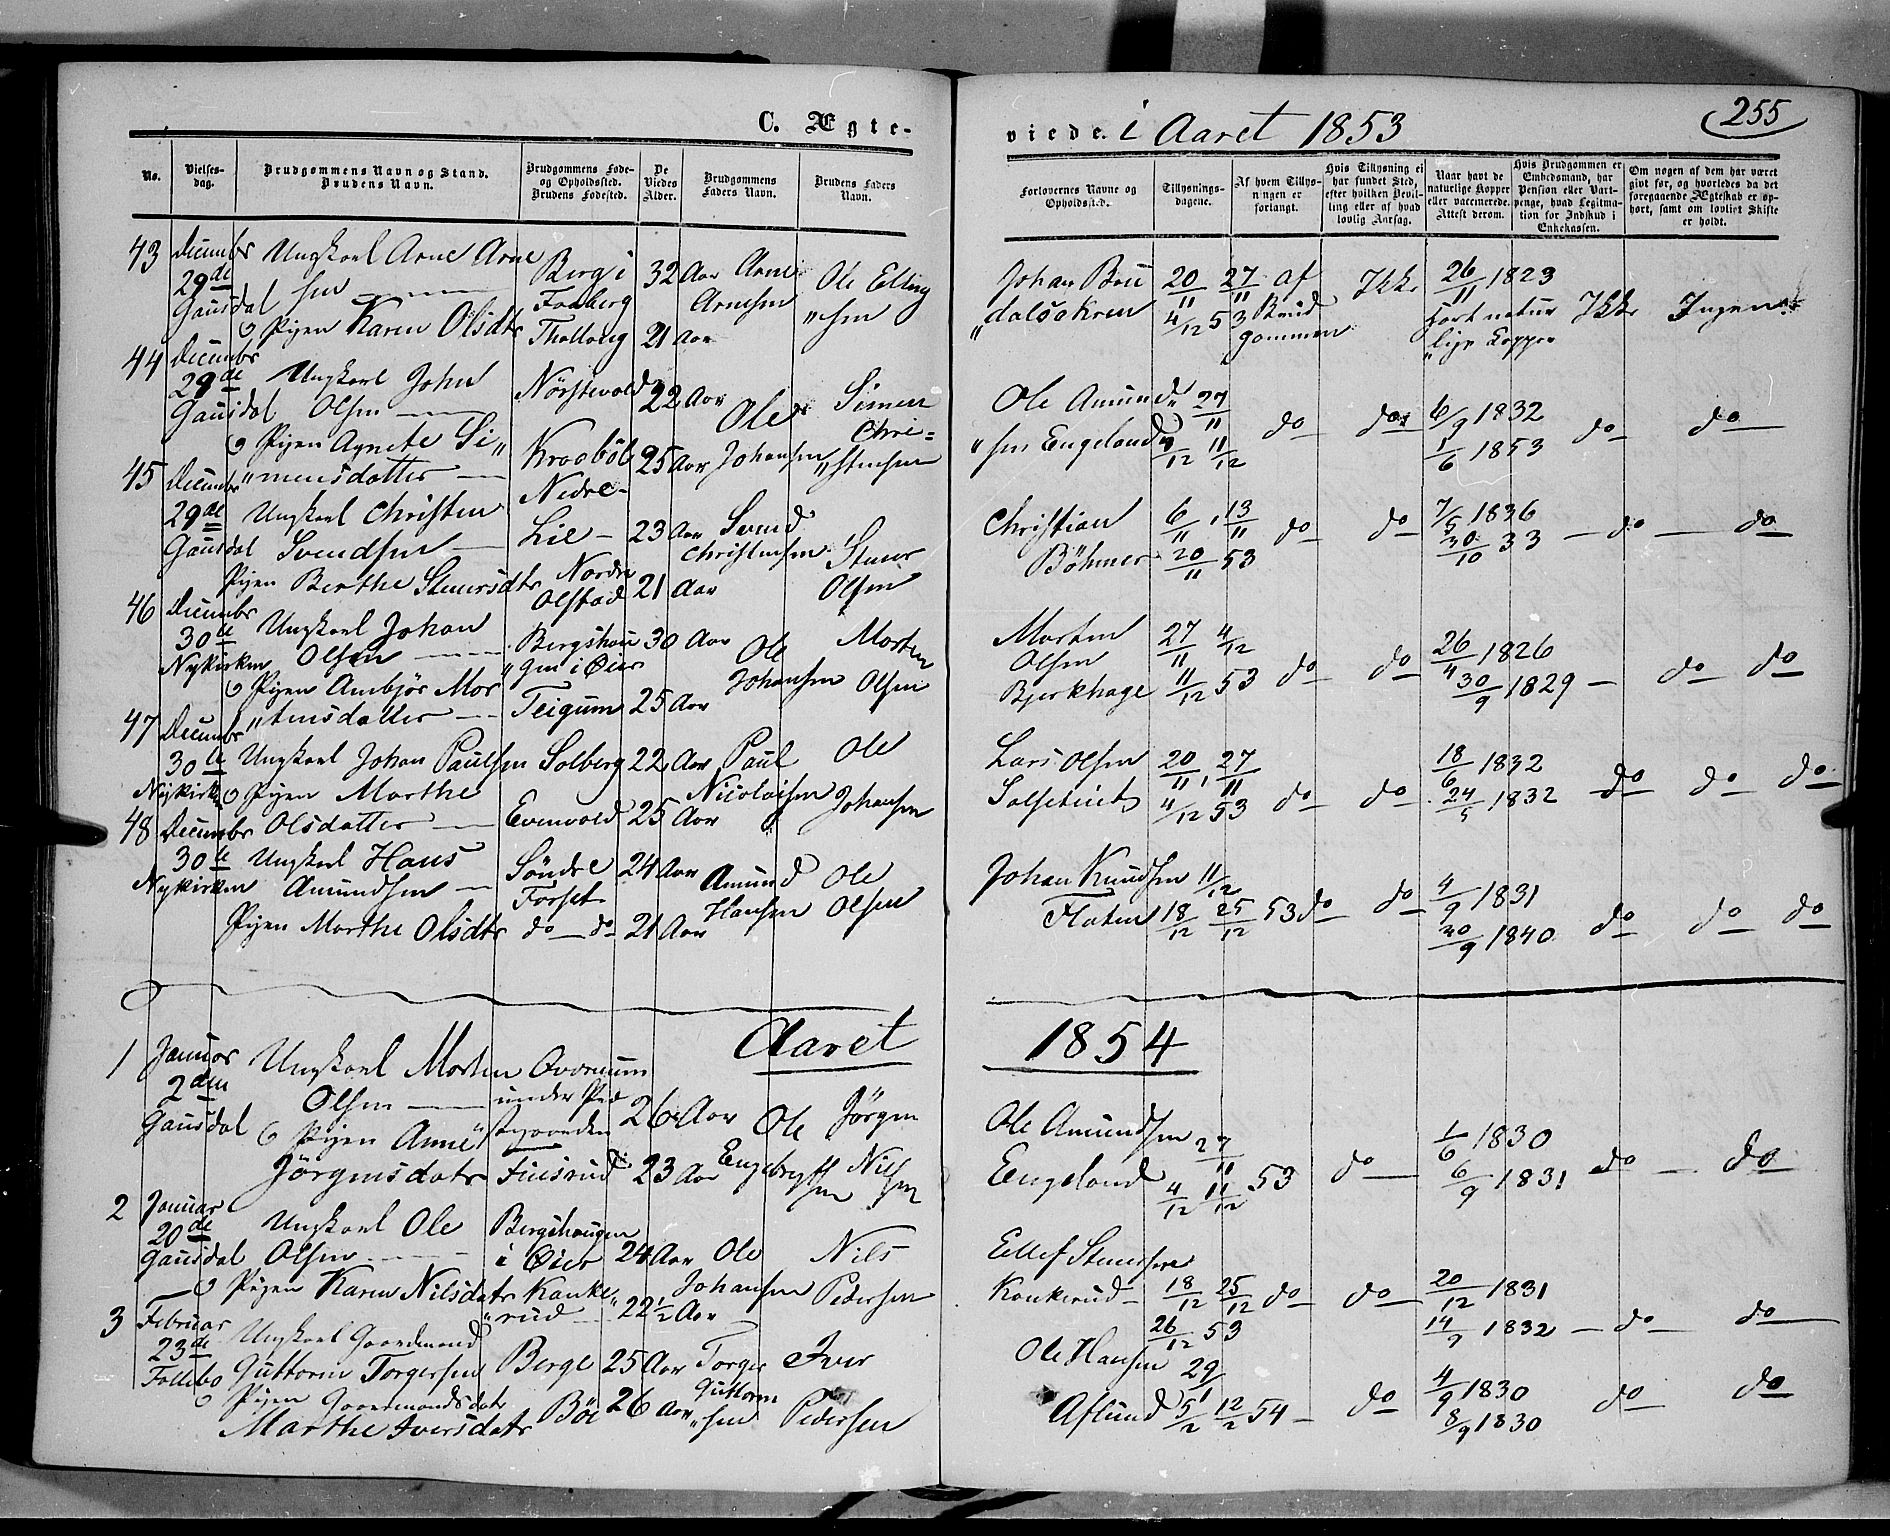 SAH, Gausdal prestekontor, Ministerialbok nr. 8, 1850-1861, s. 255